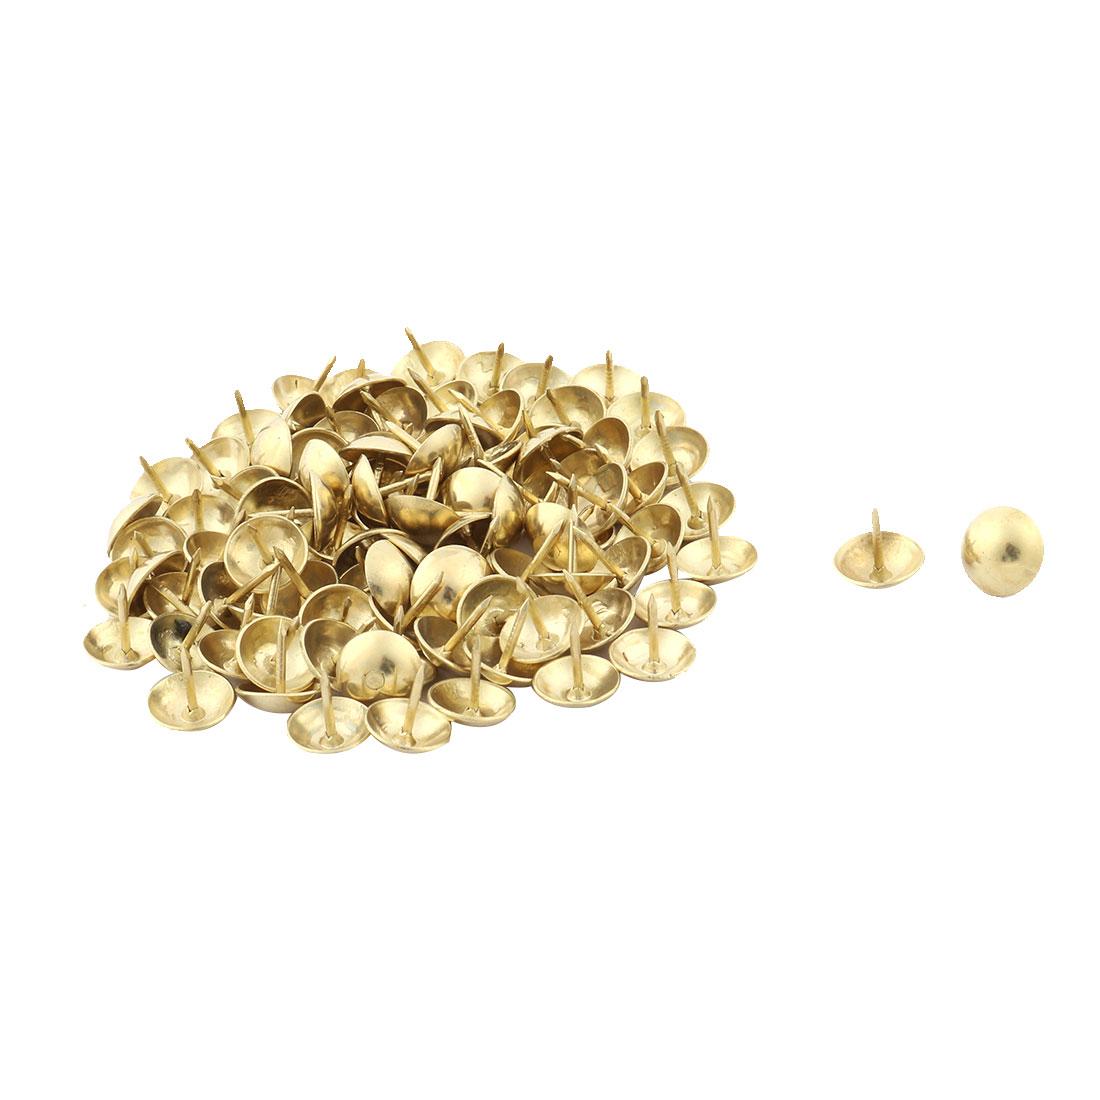 Furniture Desk Case Metal Round Cap Tack Nail Pushpin Gold Tone 11 x 11mm 98pcs